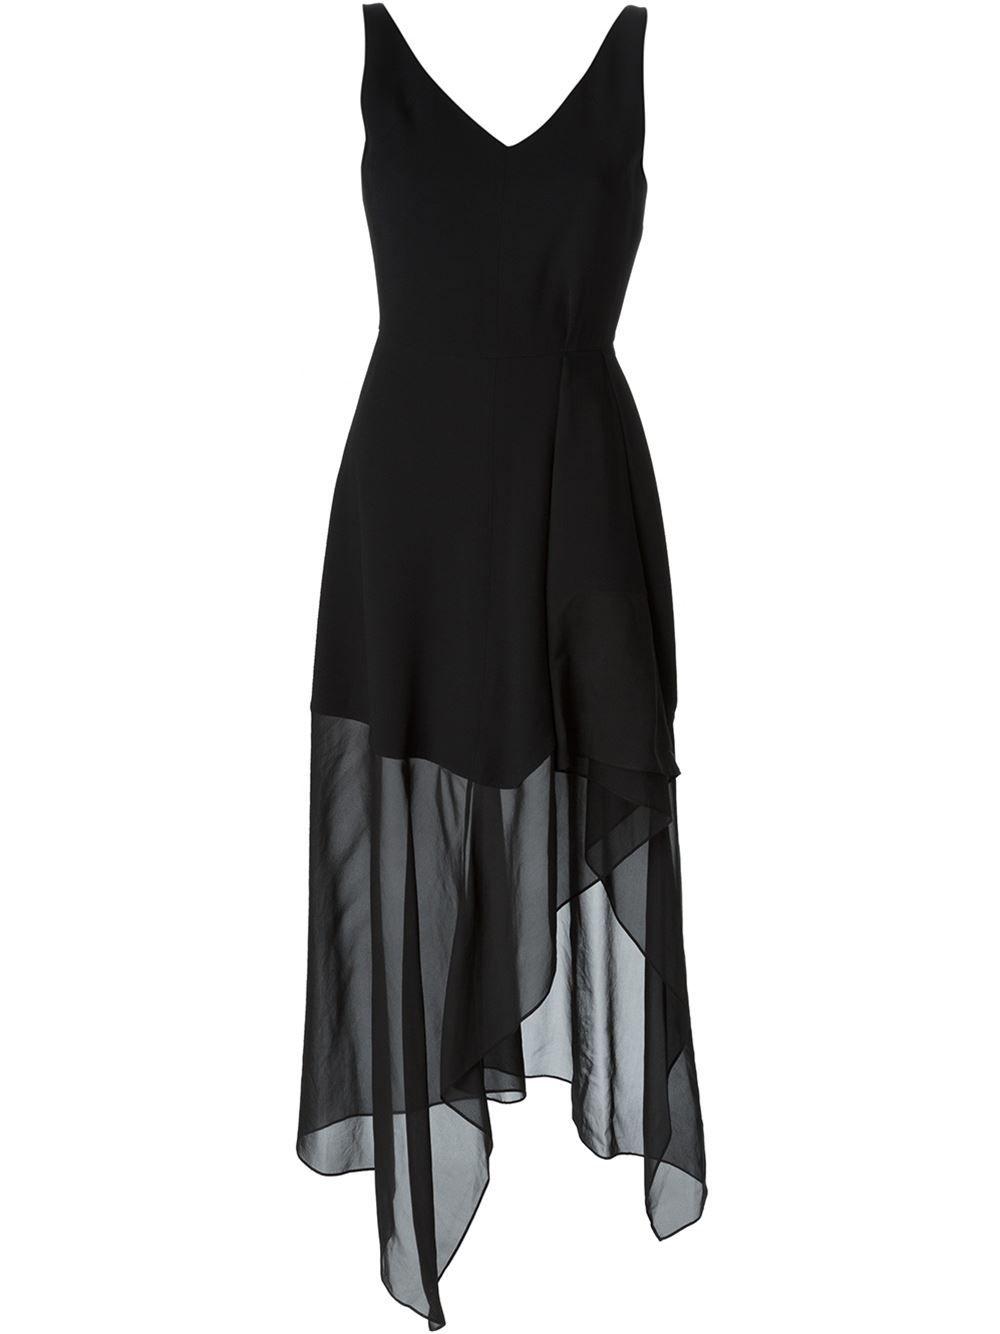 theory 'dahama register' dress - the webster - farfetch